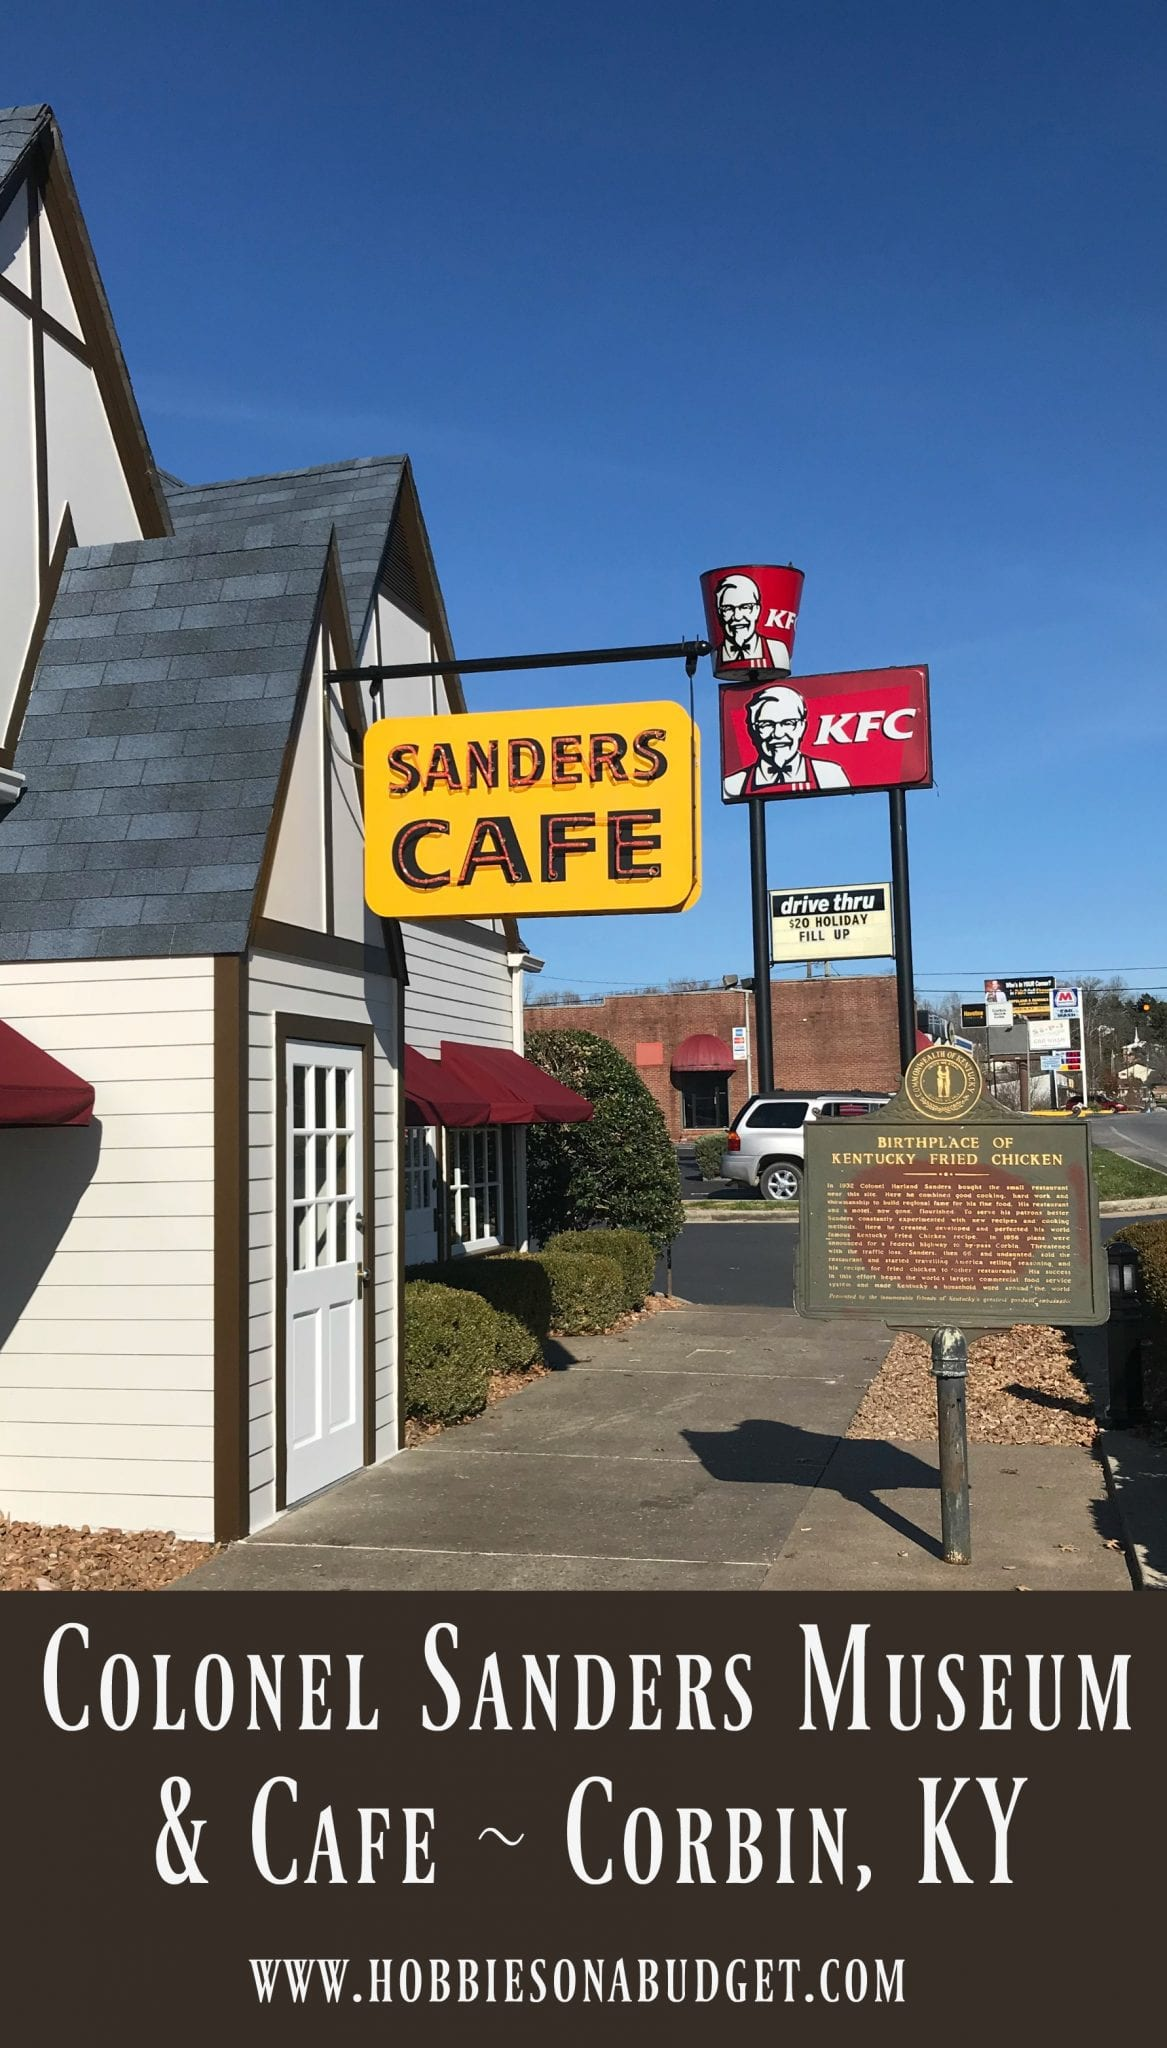 Colonel Sanders Museum & Cafe Corbin KY